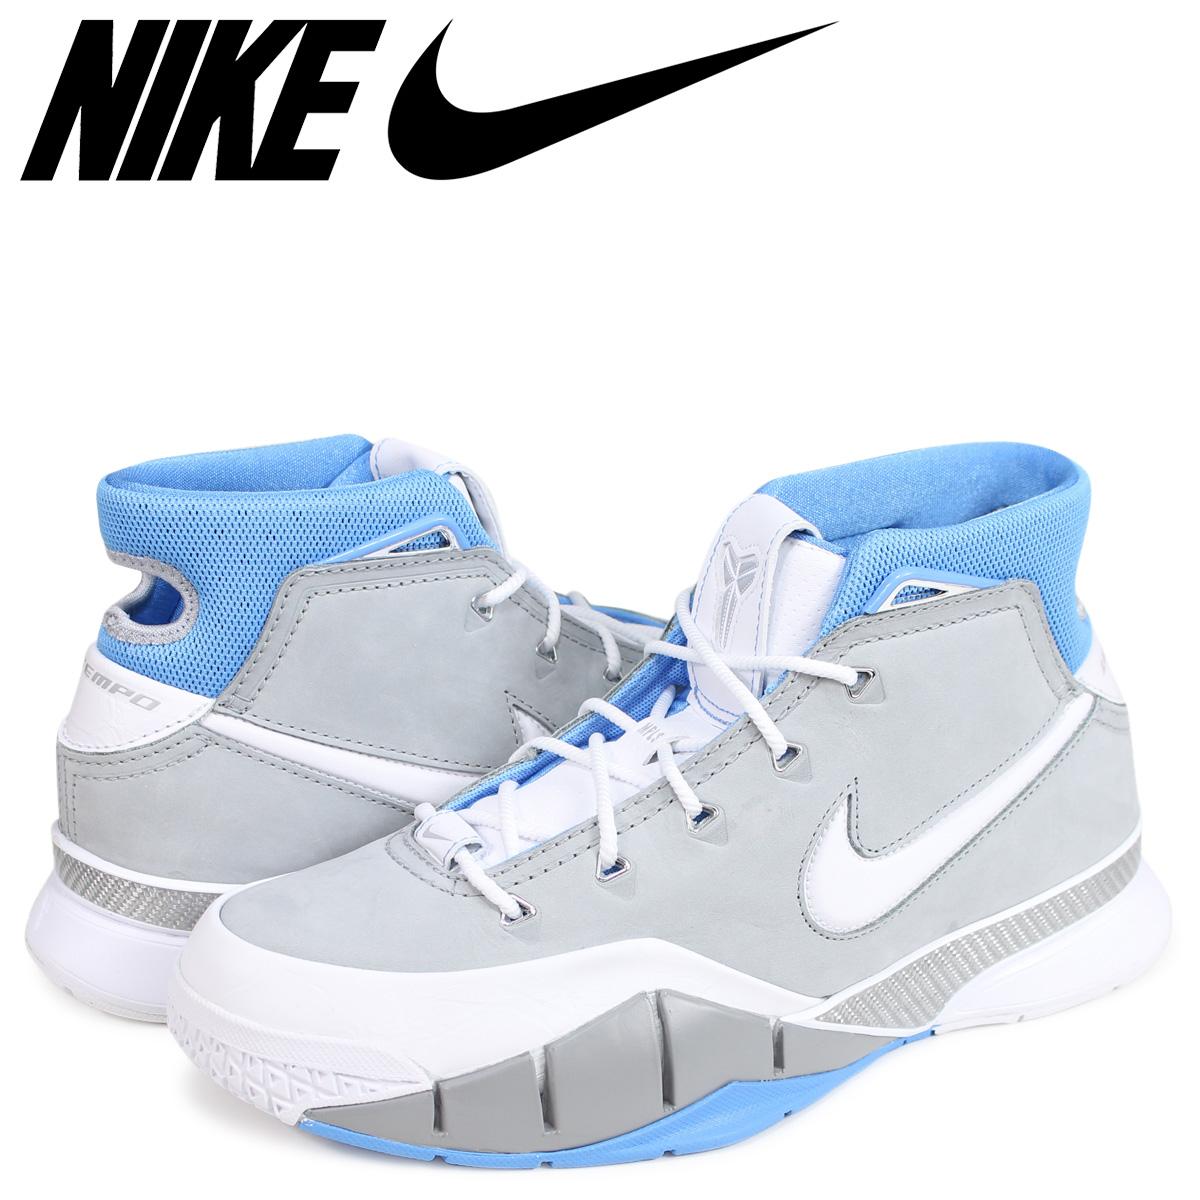 san francisco 356c6 53b37 NIKE KOBE 1 PROTRO MPLS Nike Corby 1 sneakers AQ2728-001 gray  187